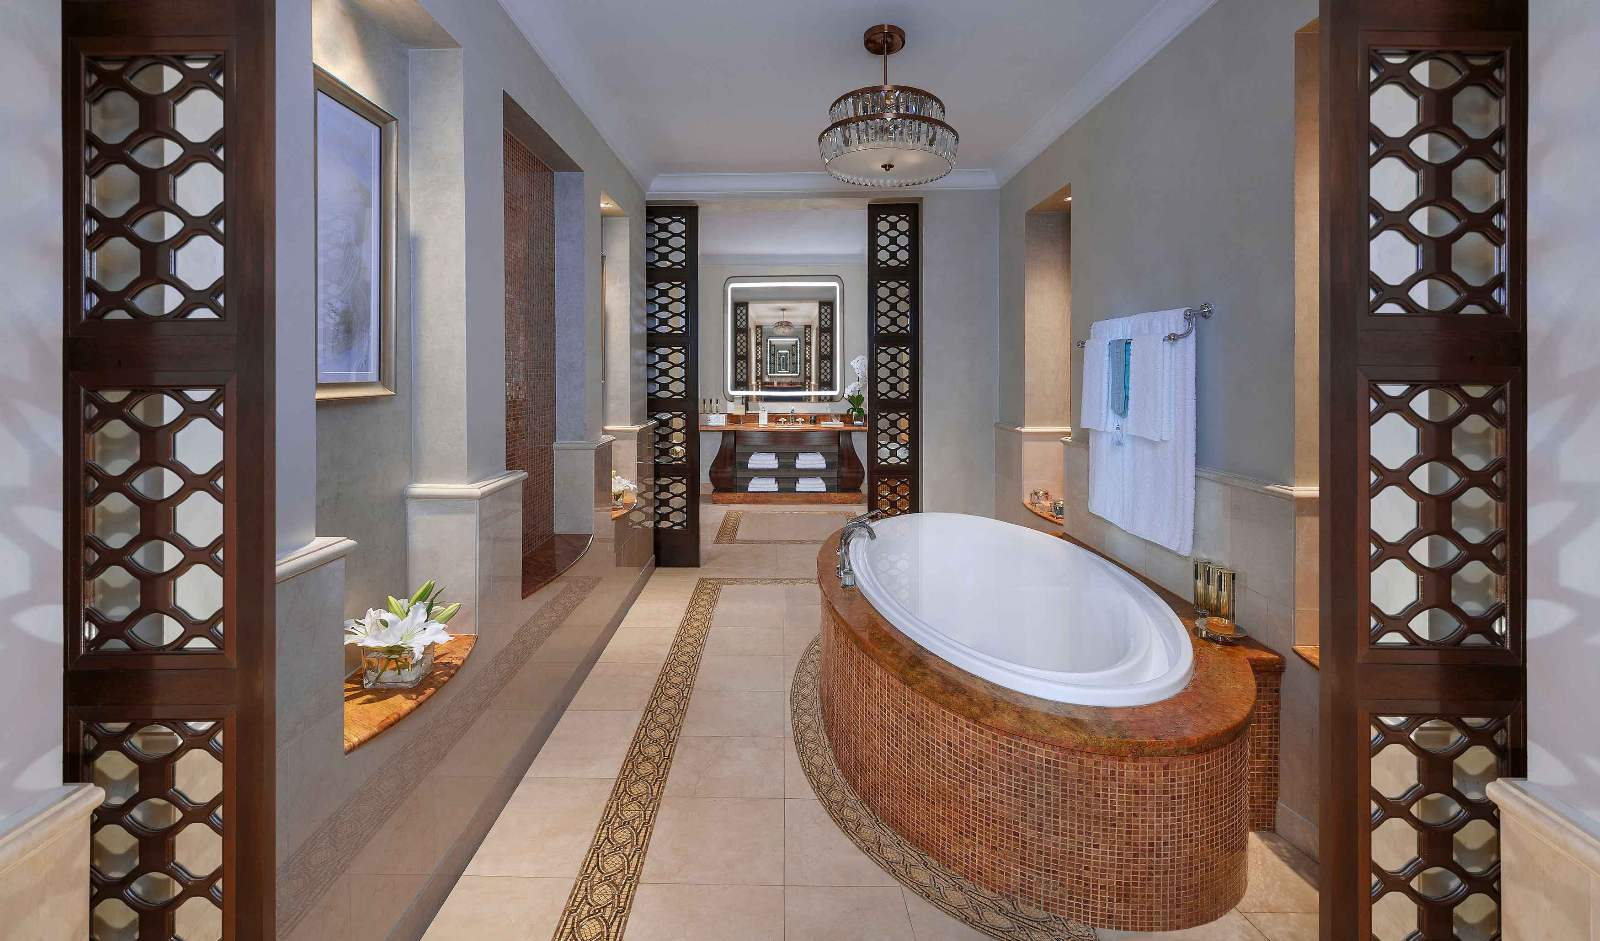 Atlantis, The Palm - Presidential Suite